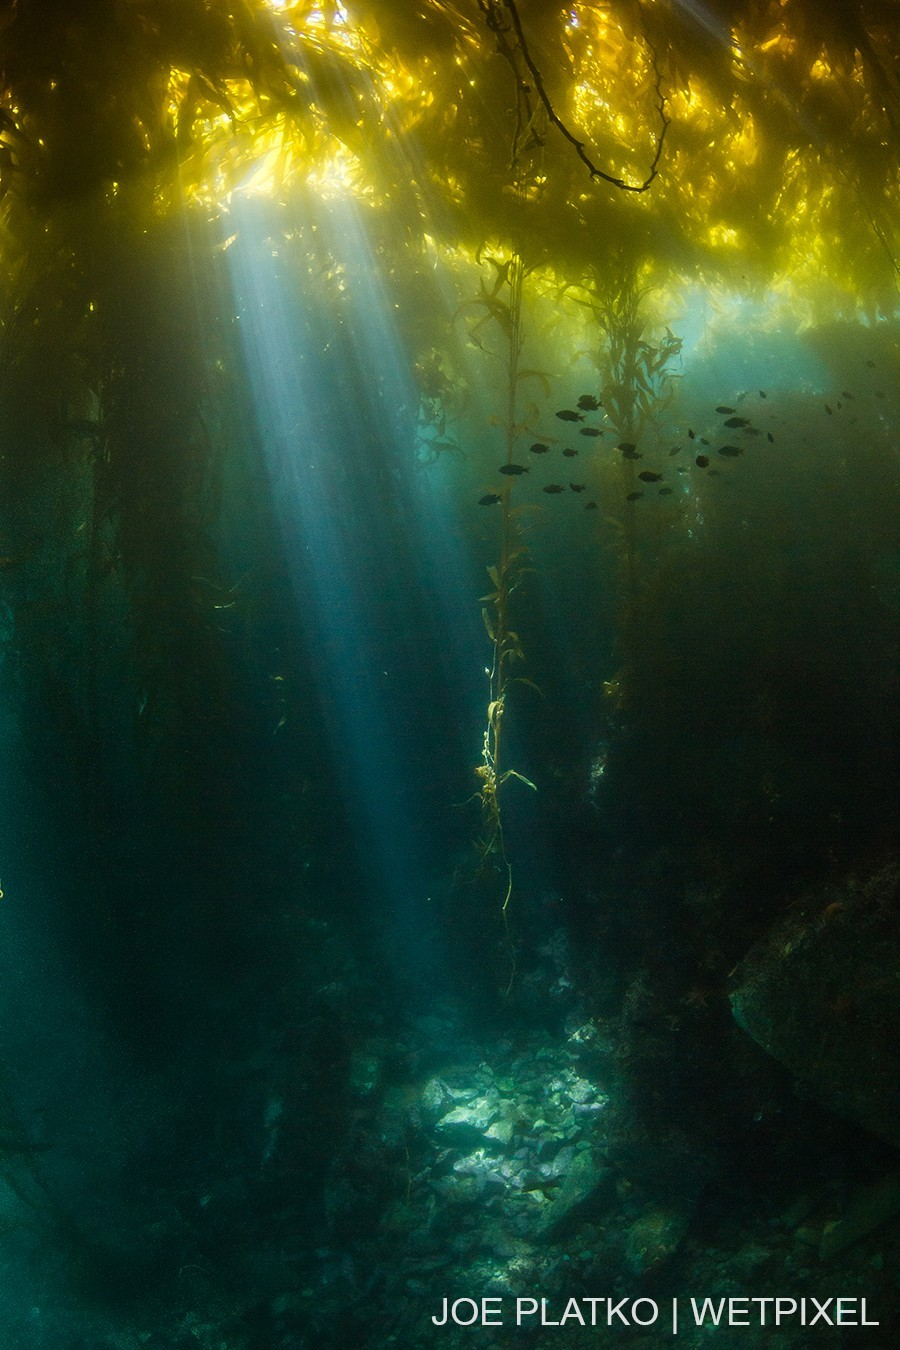 Joe Platko (Breakwater, Monterey Bay): A shaft of light cuts through the kelp canopy, illuminating the rocky floor below.